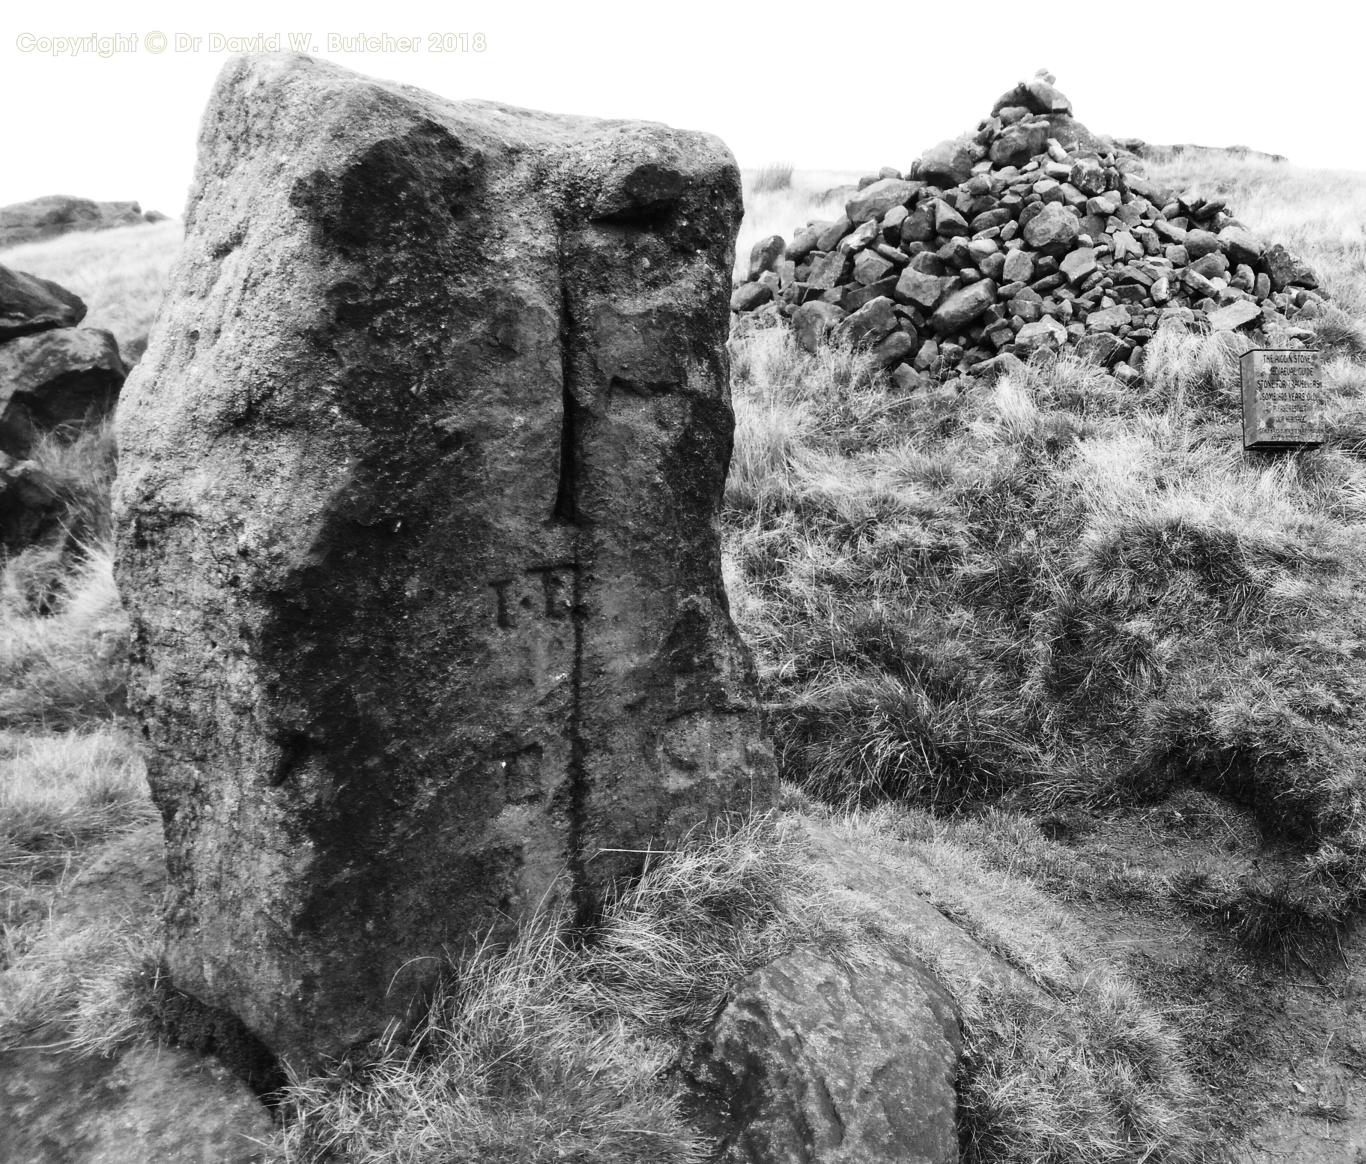 Aiggin Stone mediaeval guide stone for travellers on Blackstone Edge on Pennine Way